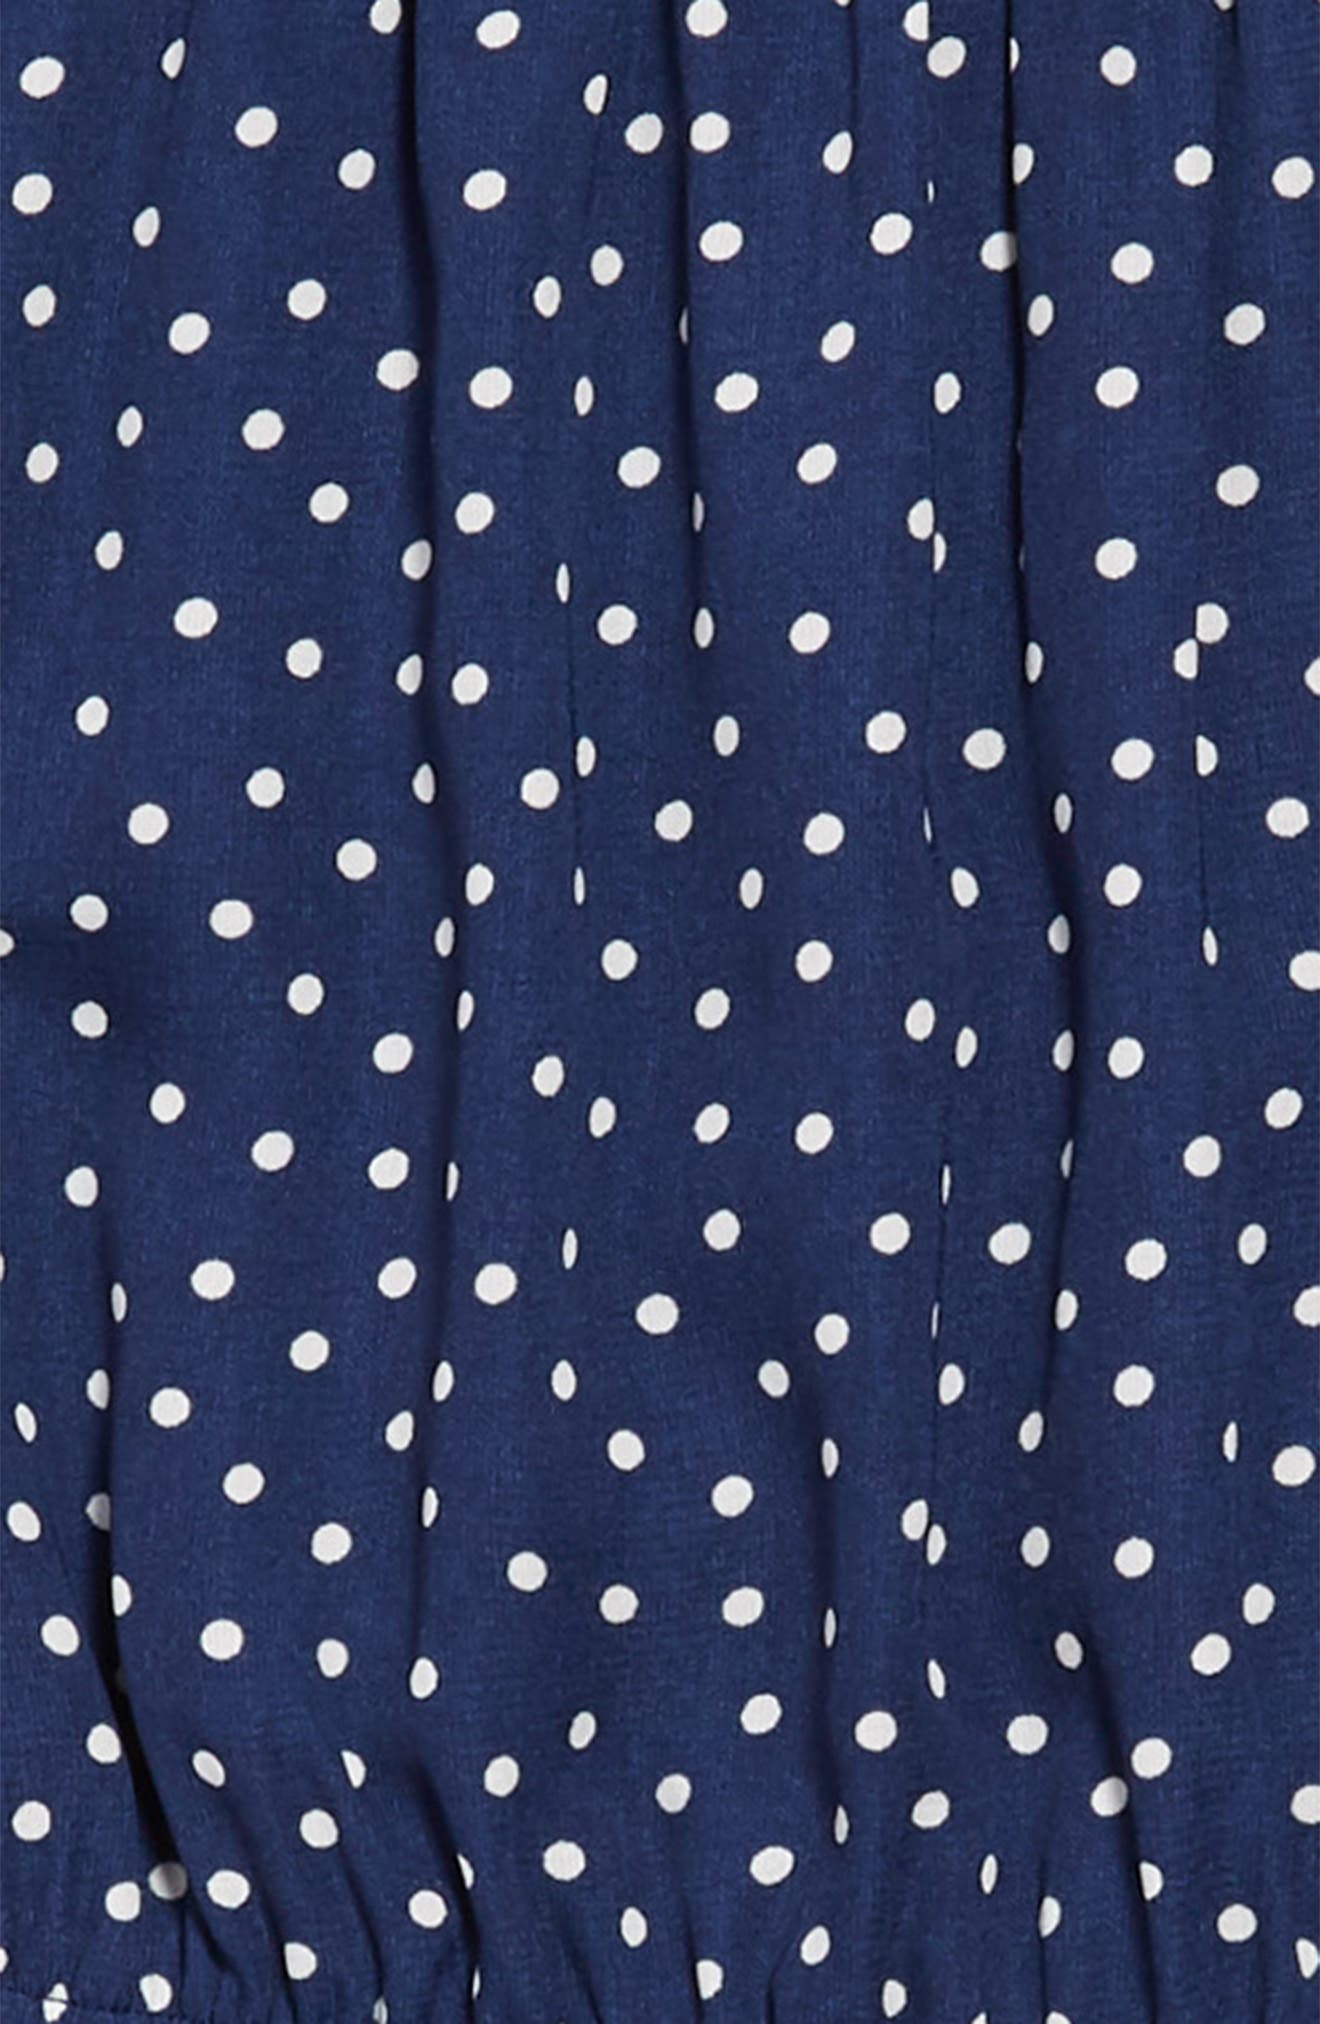 Ruffle Dress,                             Alternate thumbnail 3, color,                             401